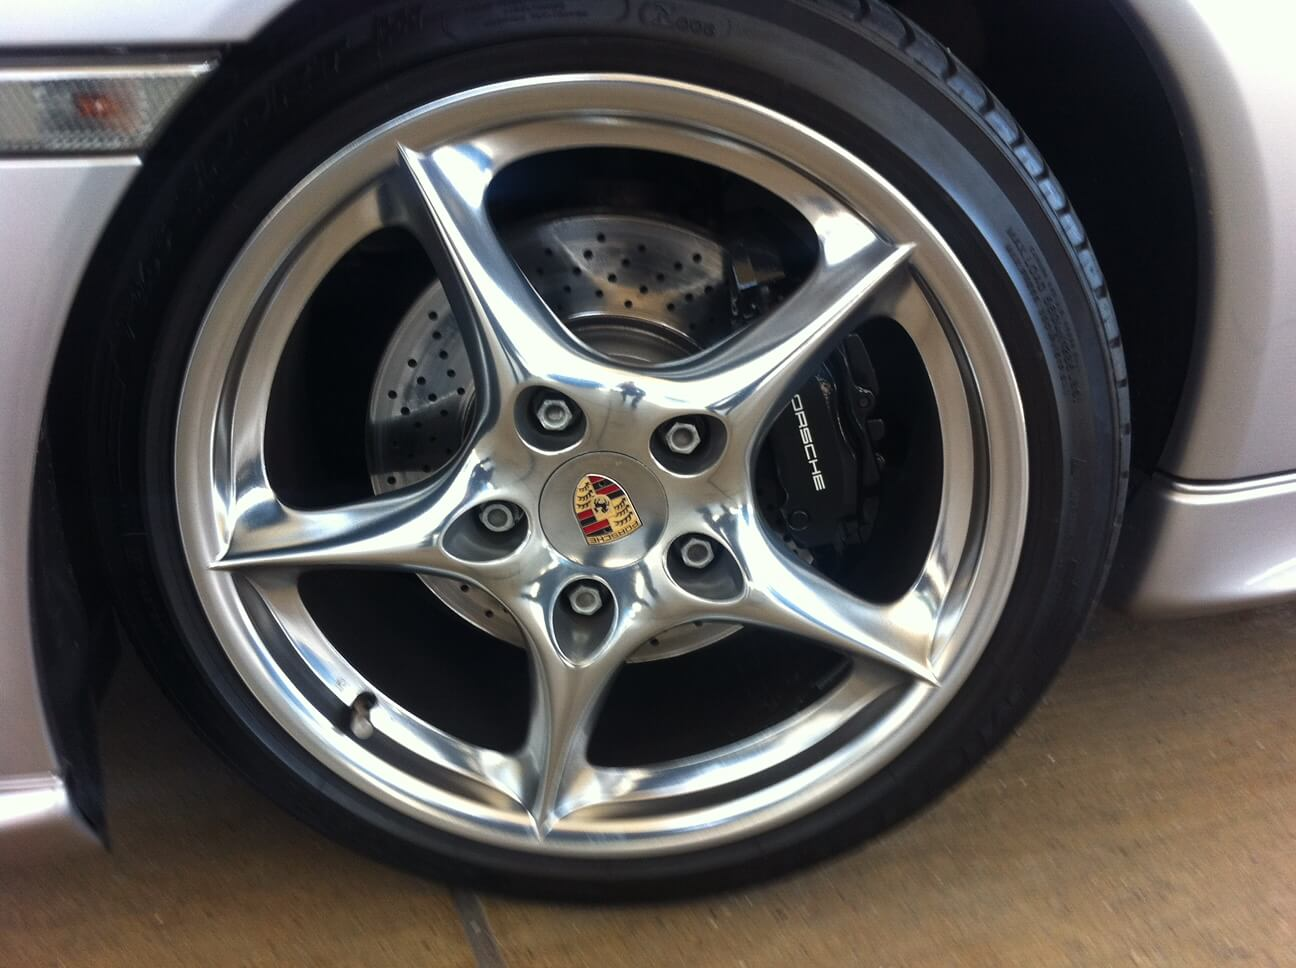 Porsche-996-Carrera-Nr62-B02